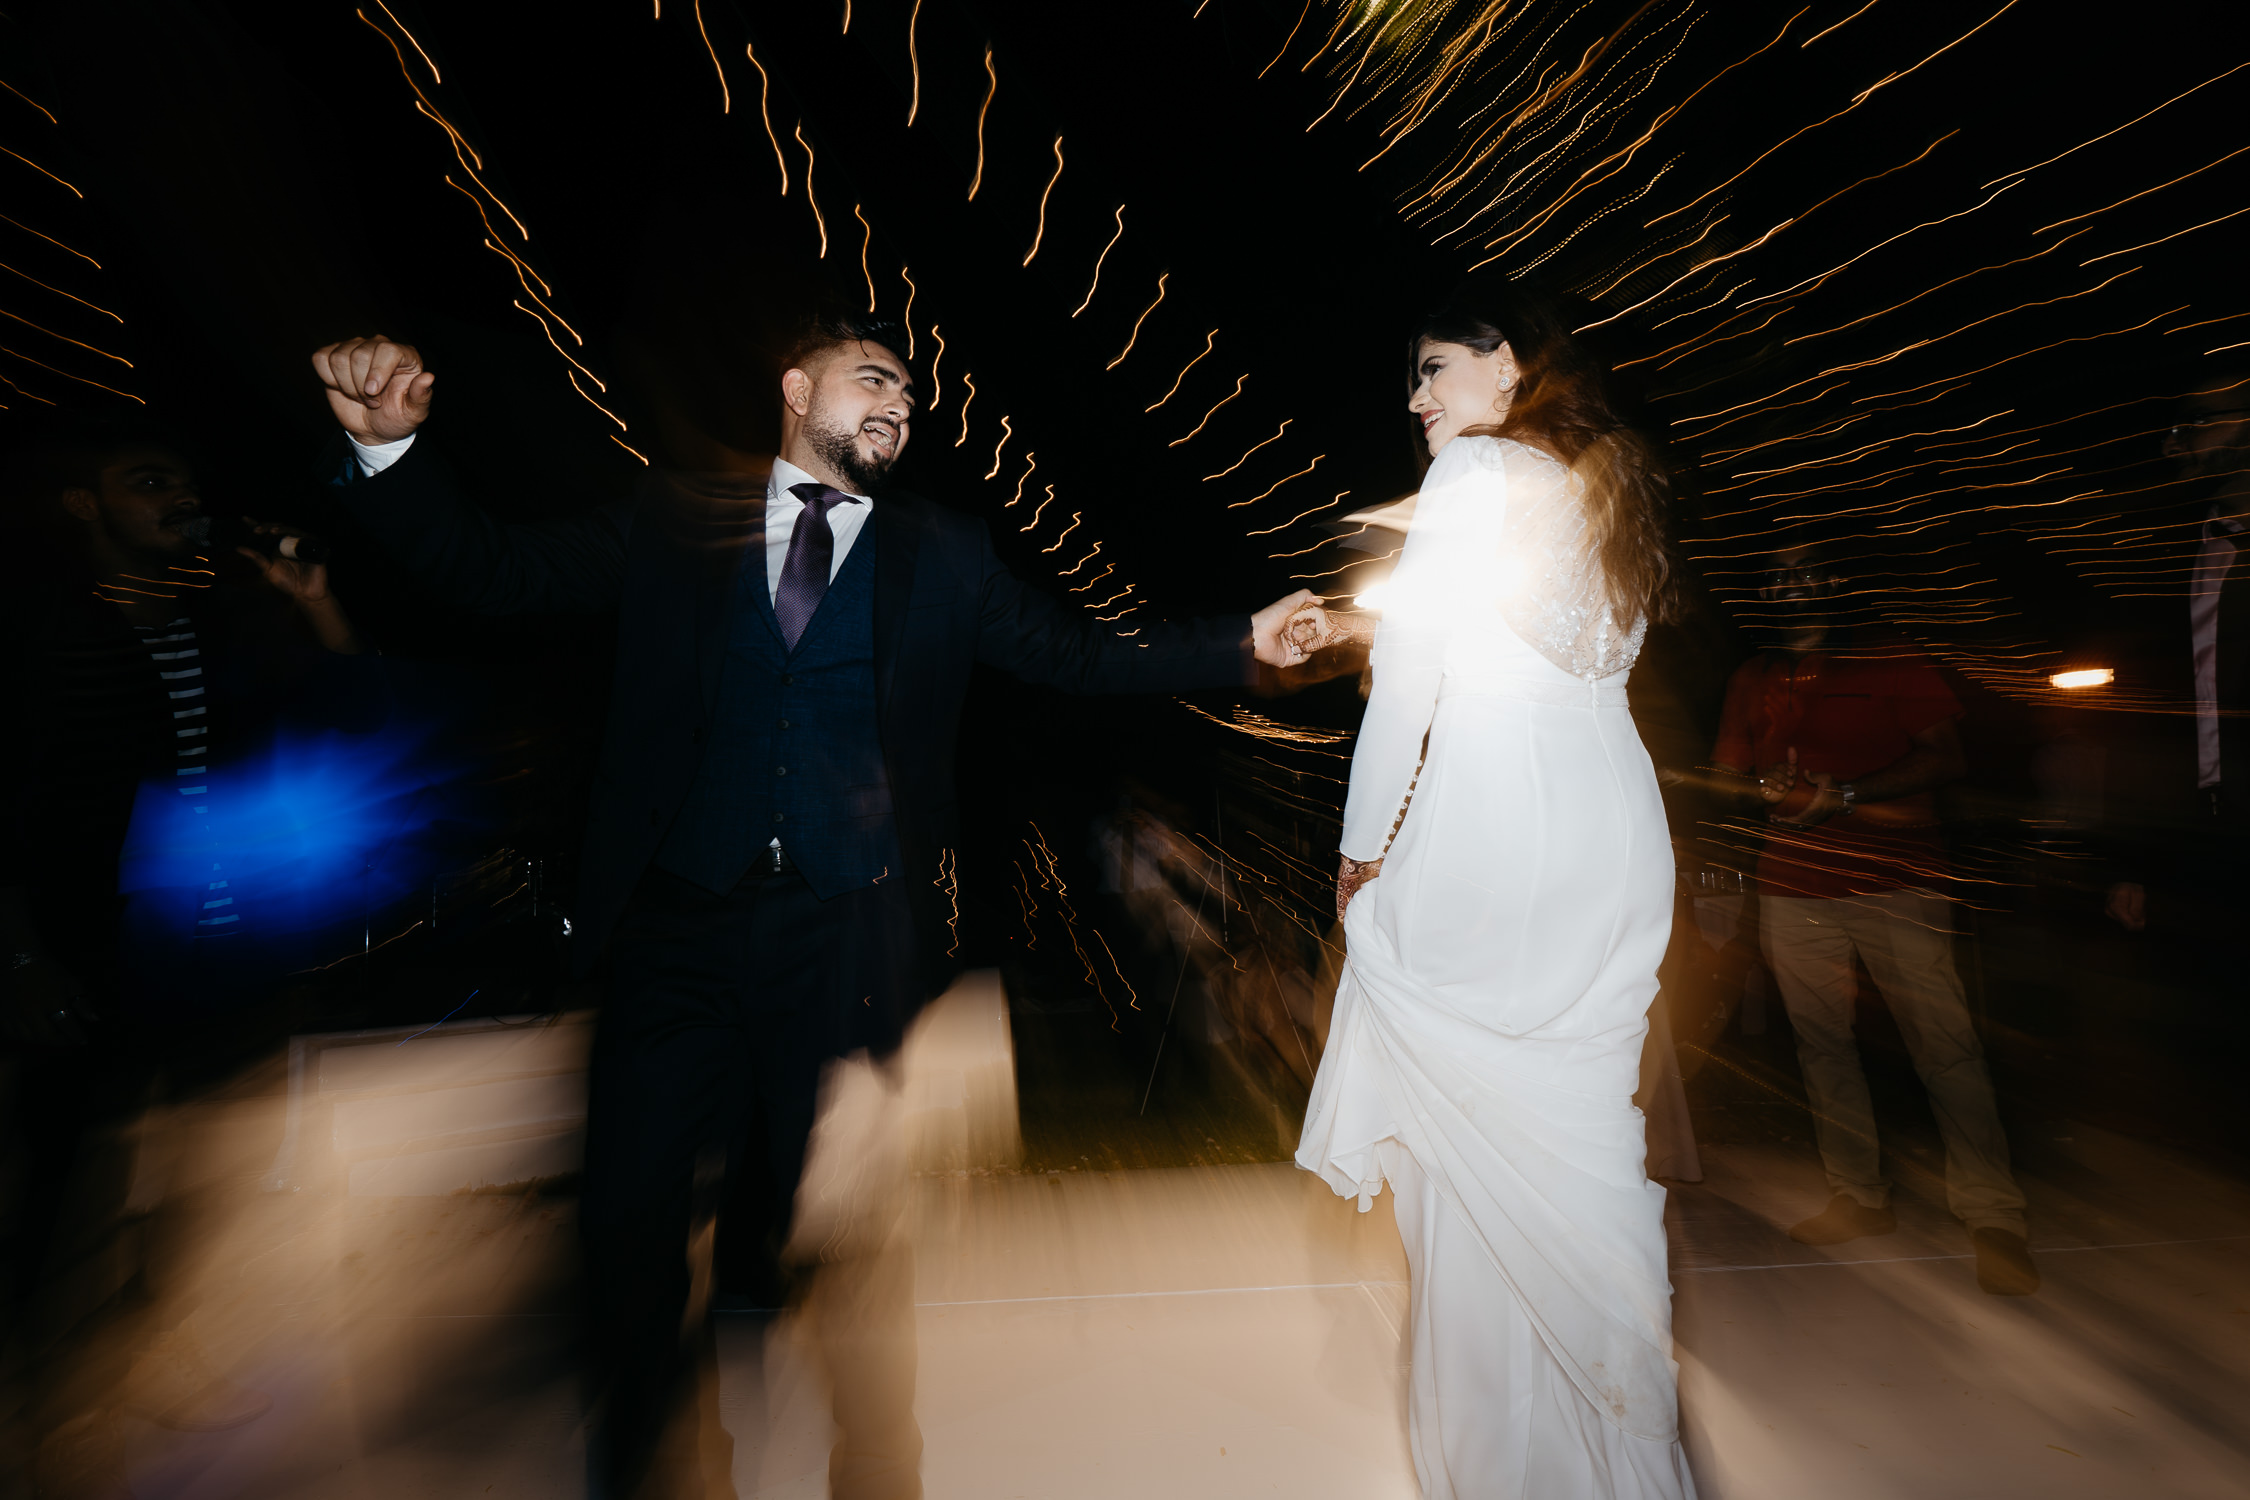 destination-wedding-photographer-amsterdam-Aqil Benazir-483.jpg